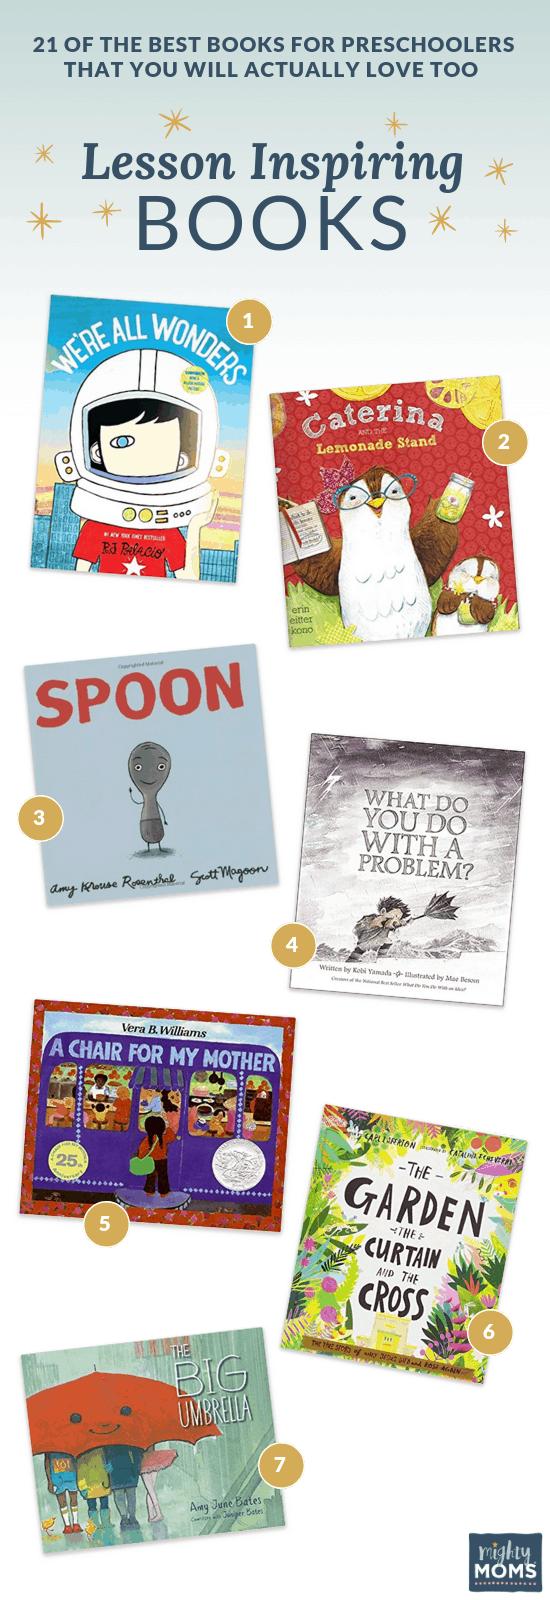 Best Preschool Books with an Inspiring Message - MightyMoms.club